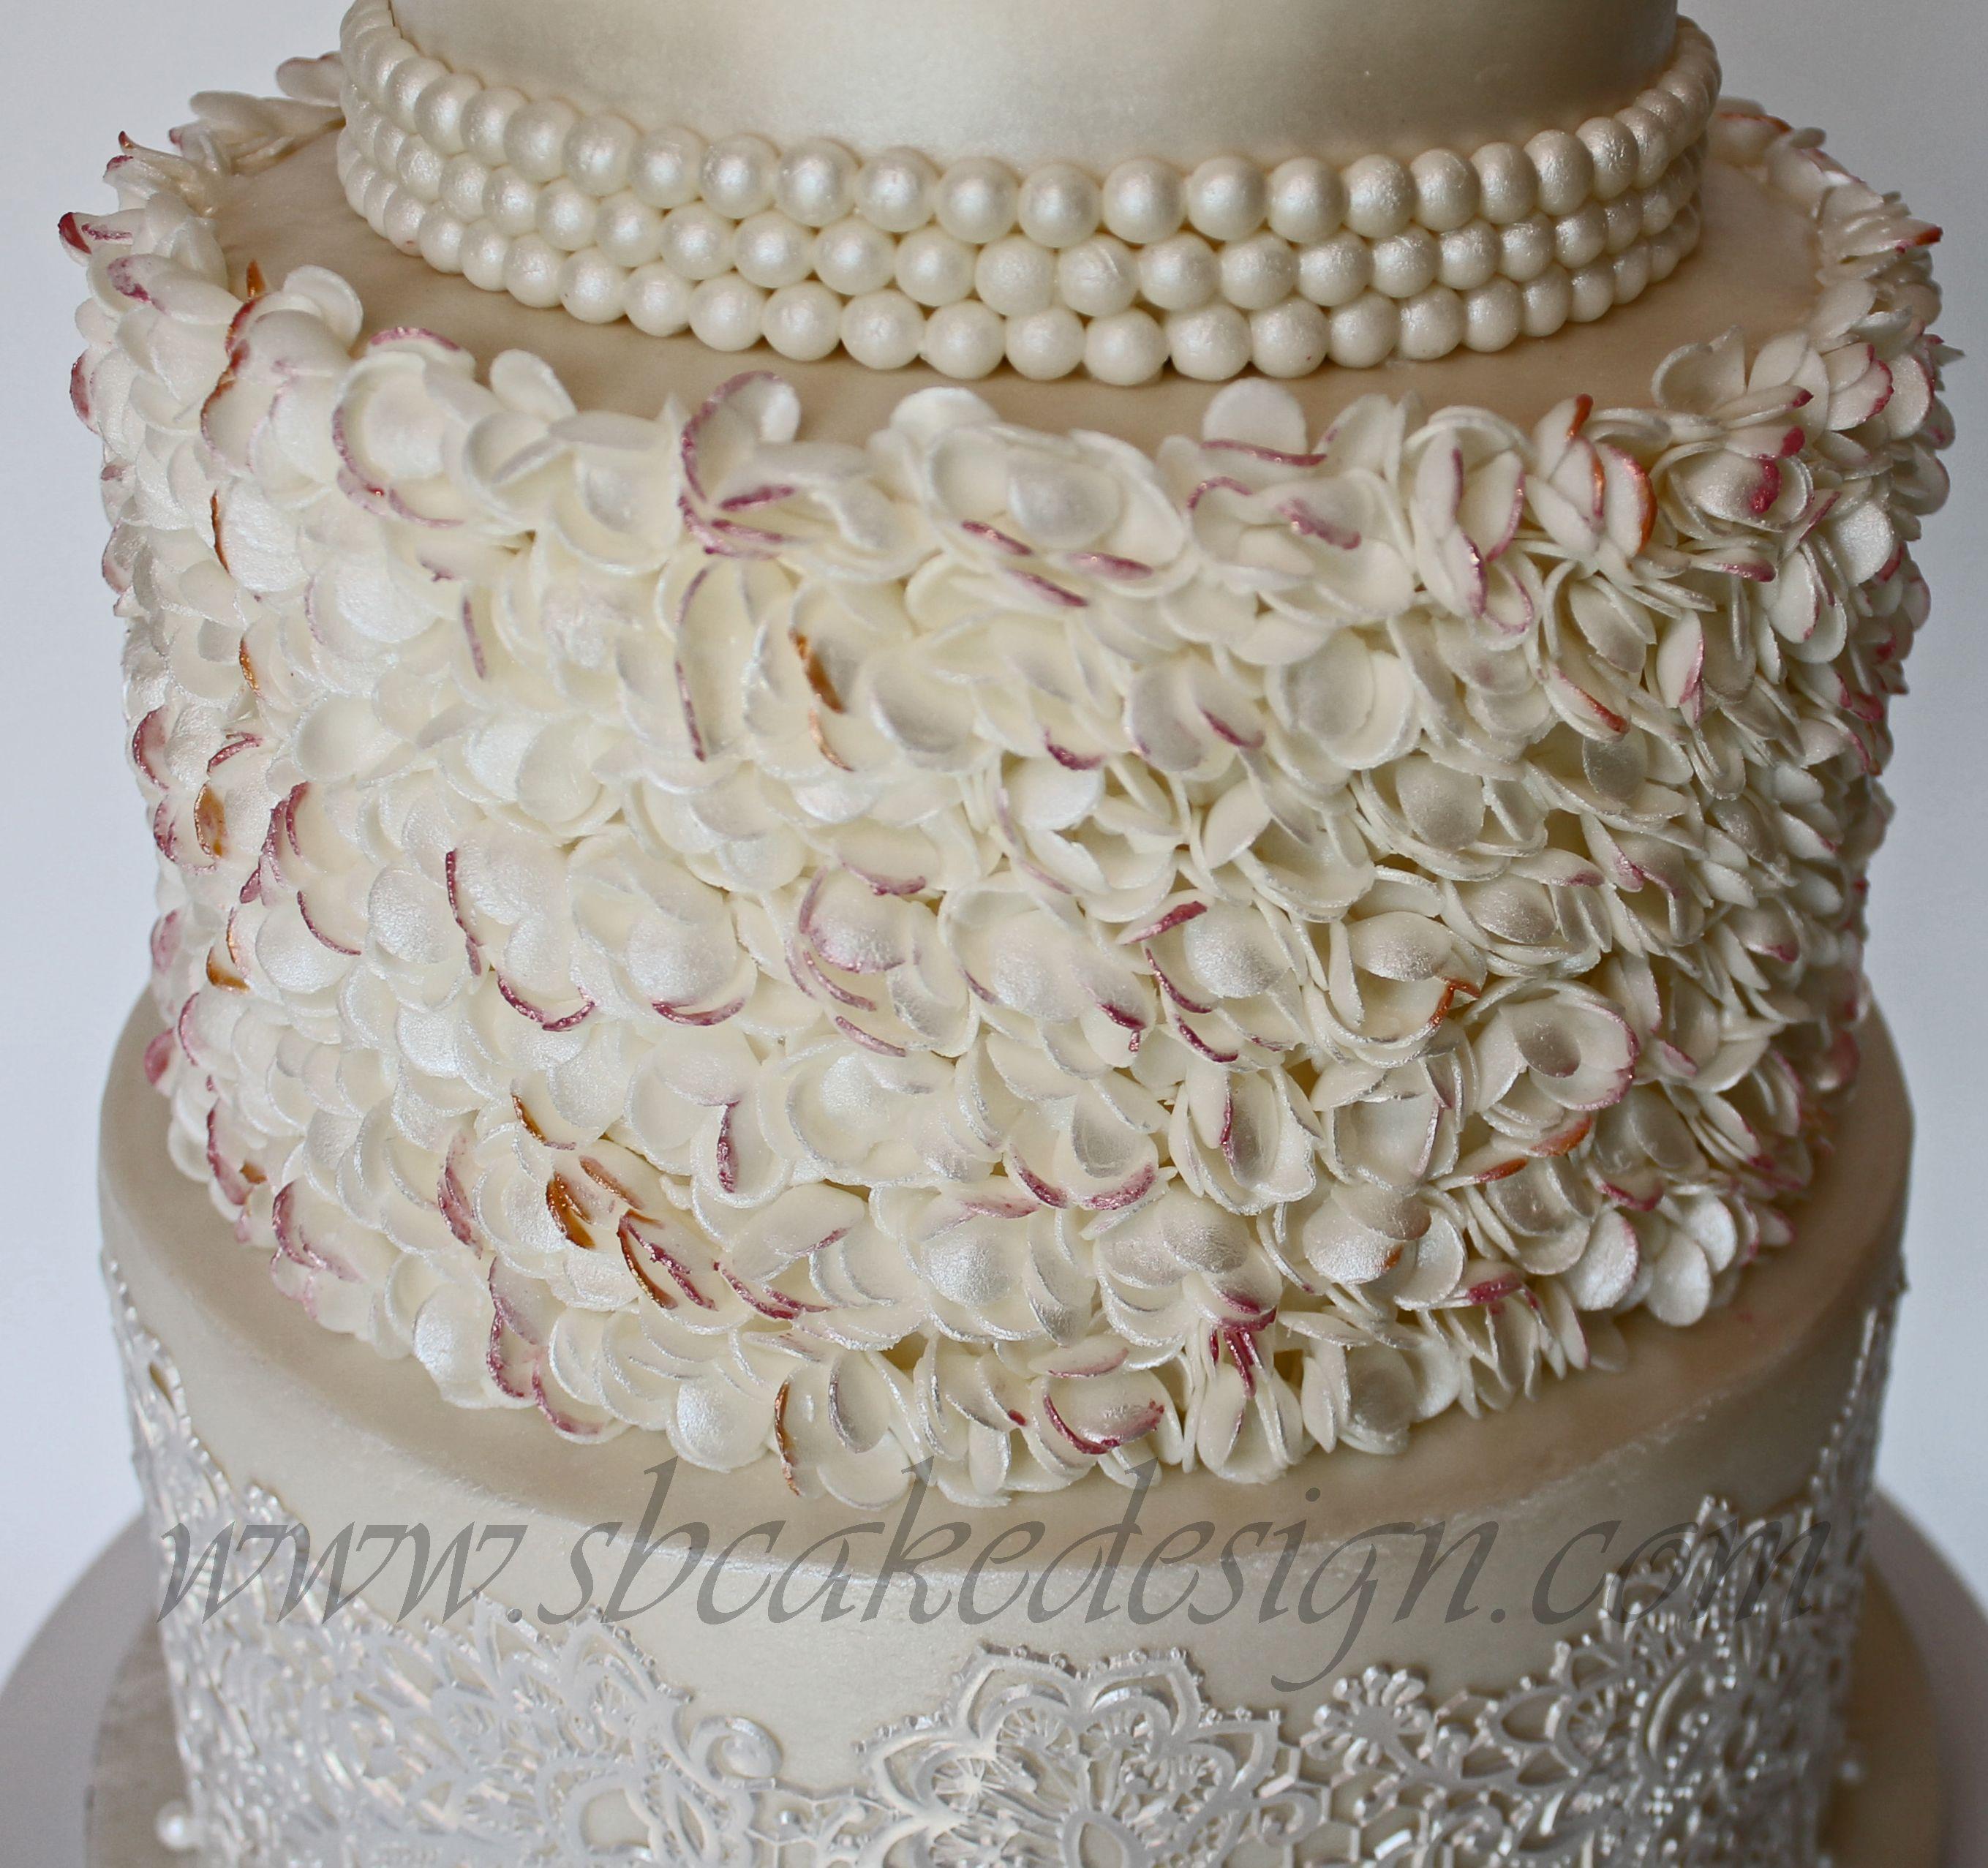 Shannon Bond Cake Design Petal Ruffle Wedding Cake www